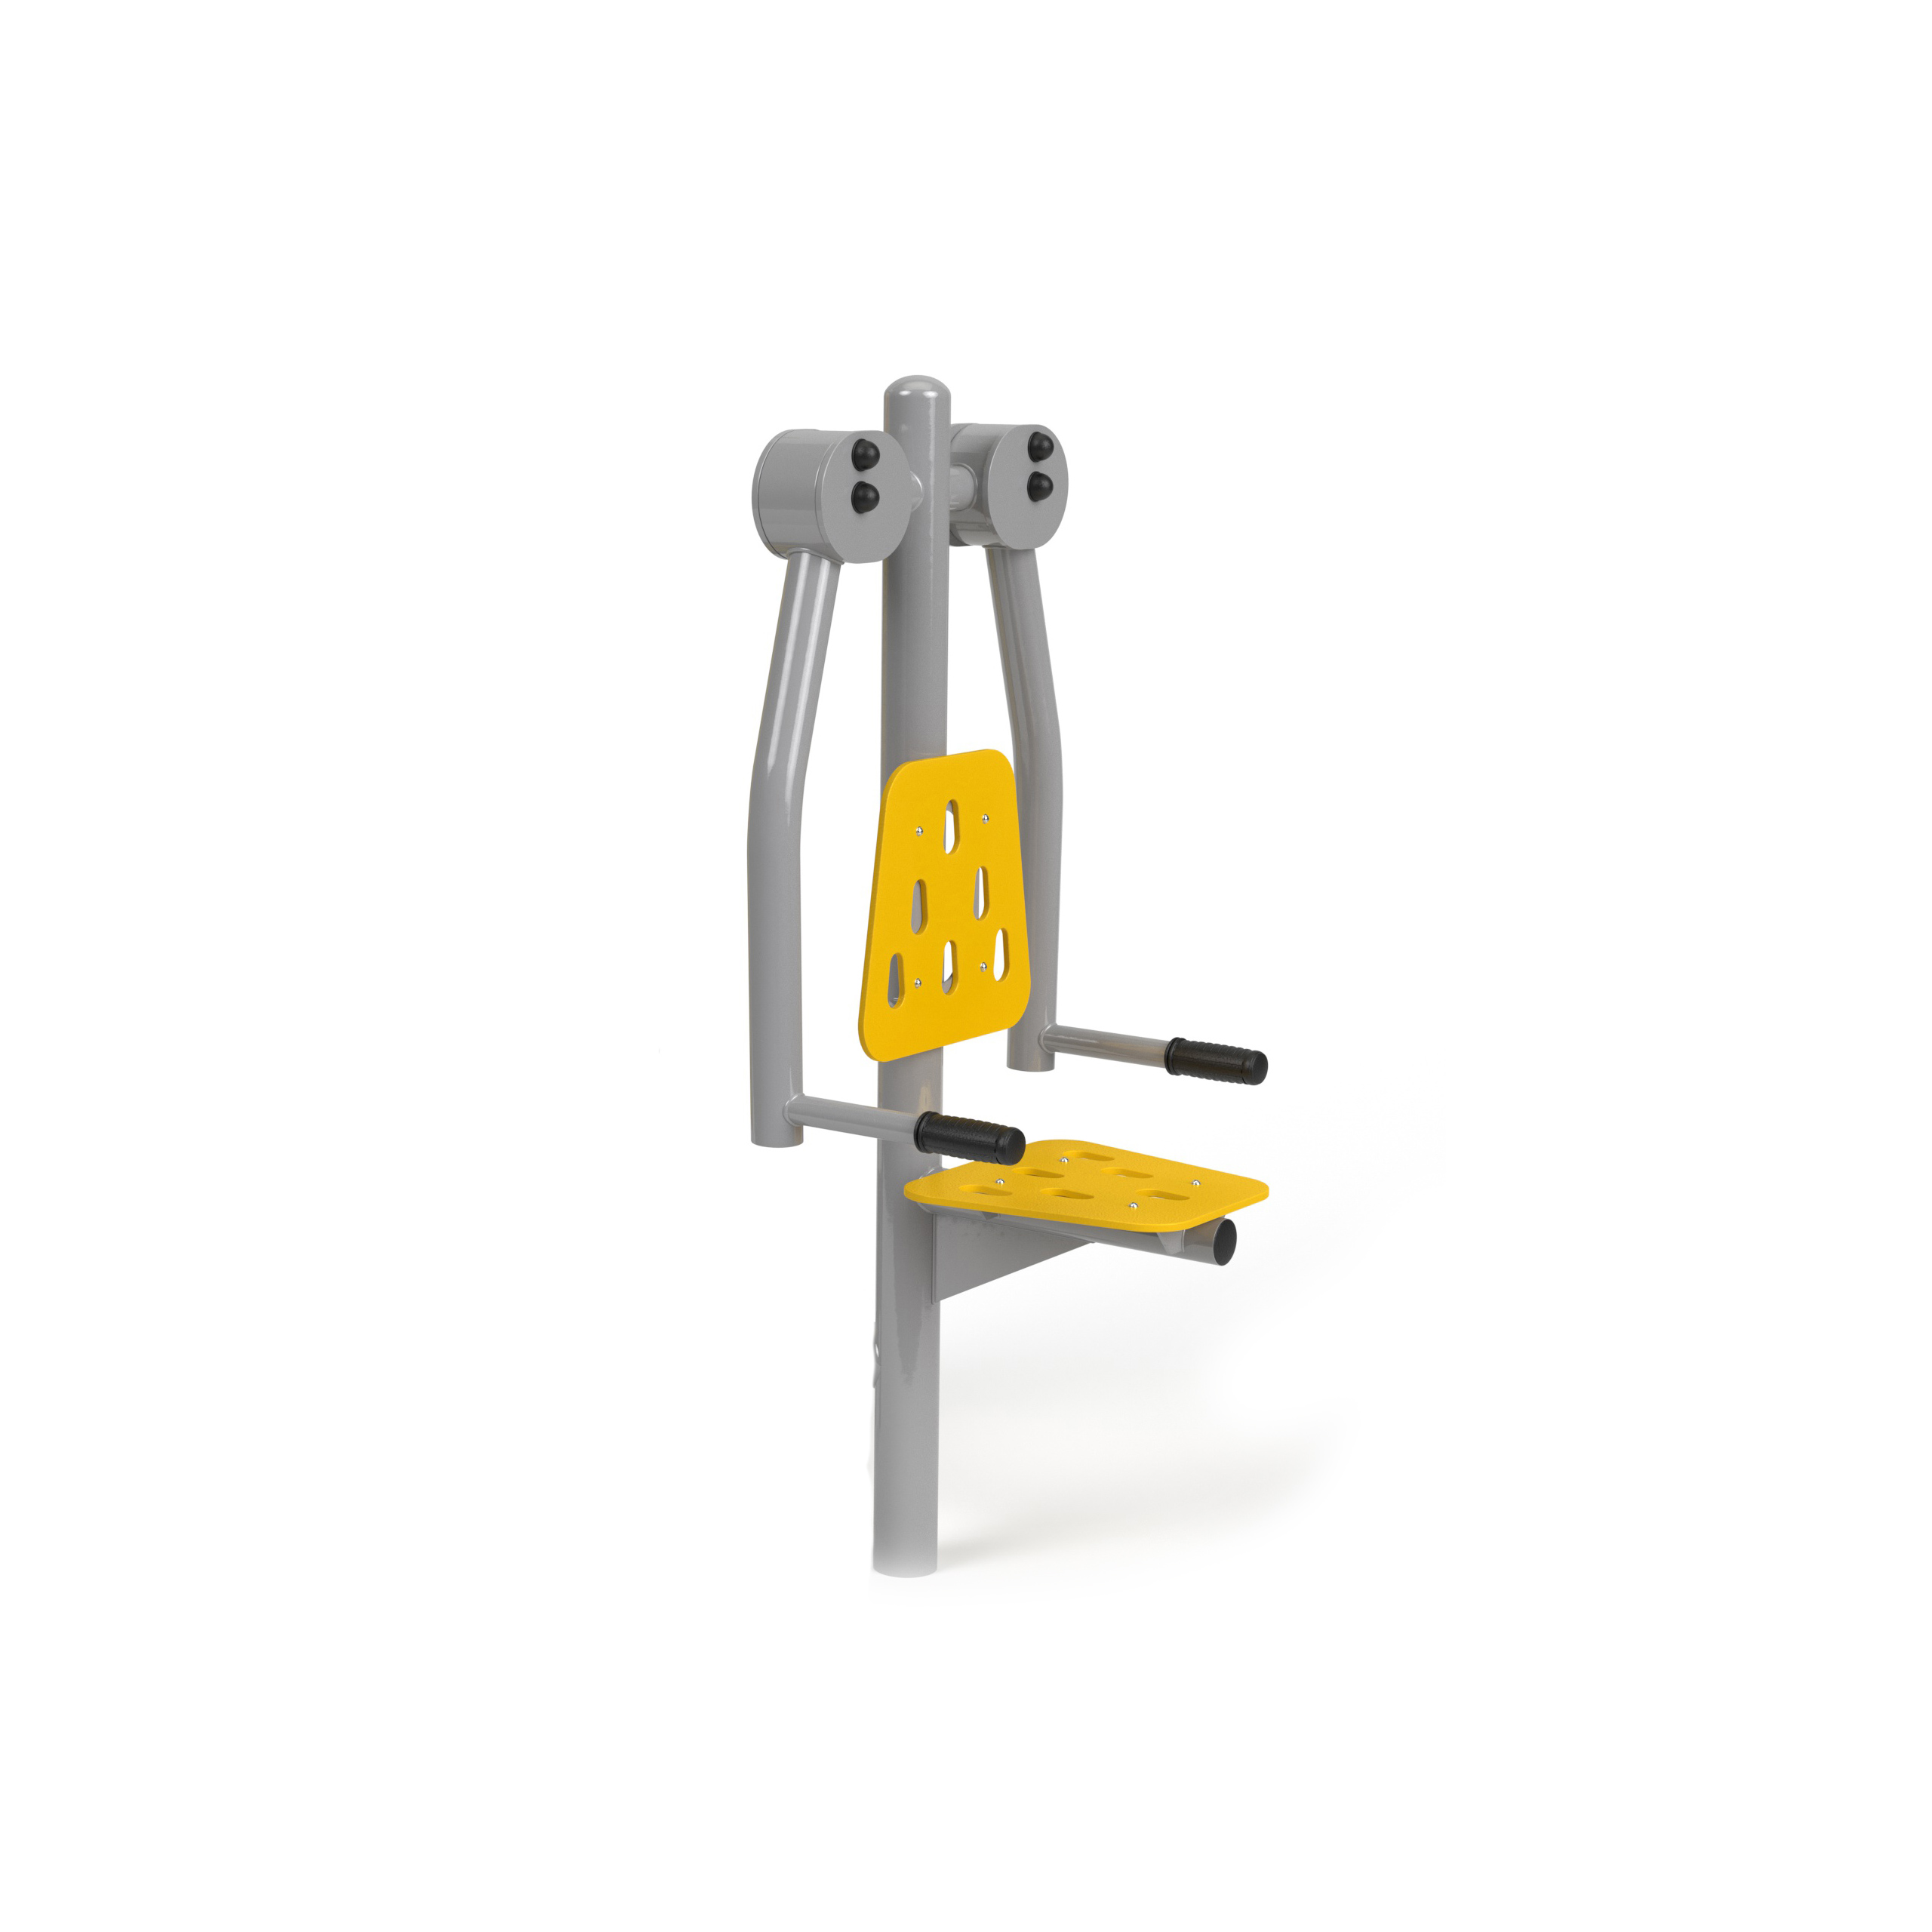 Arm Lift Trainer Outdoor Fitness Equipment